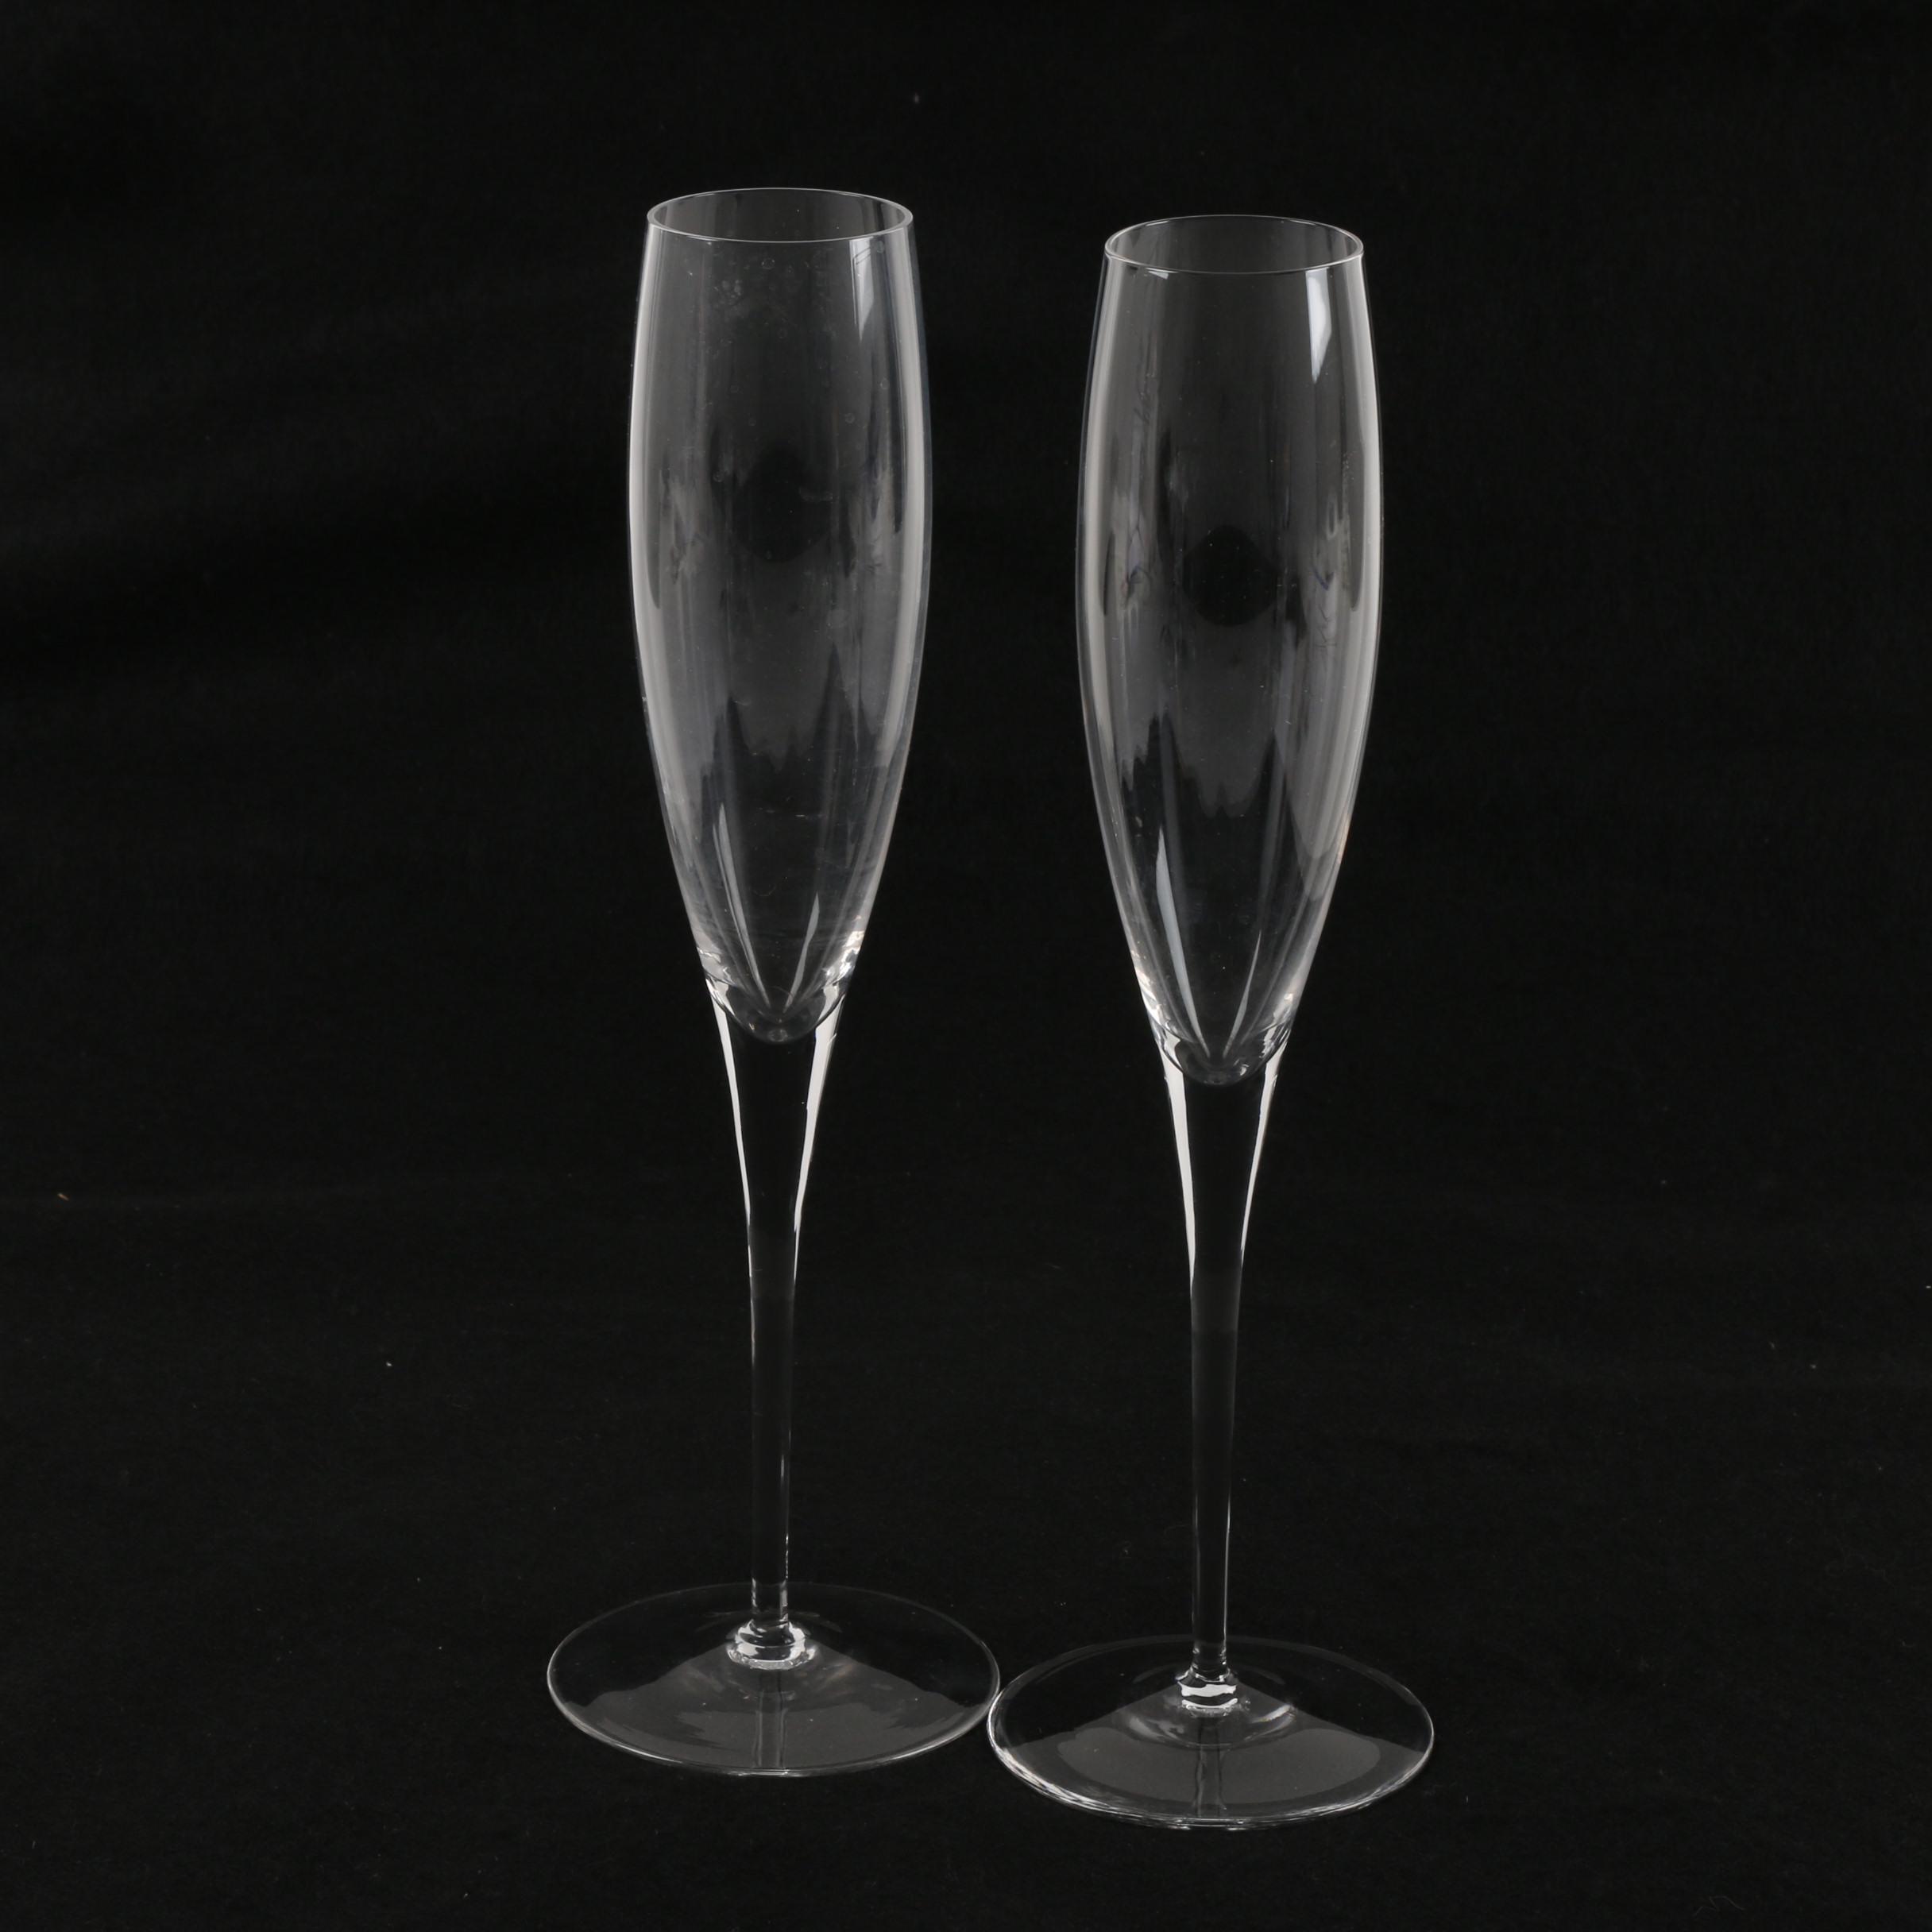 Glass Champagne Flutes